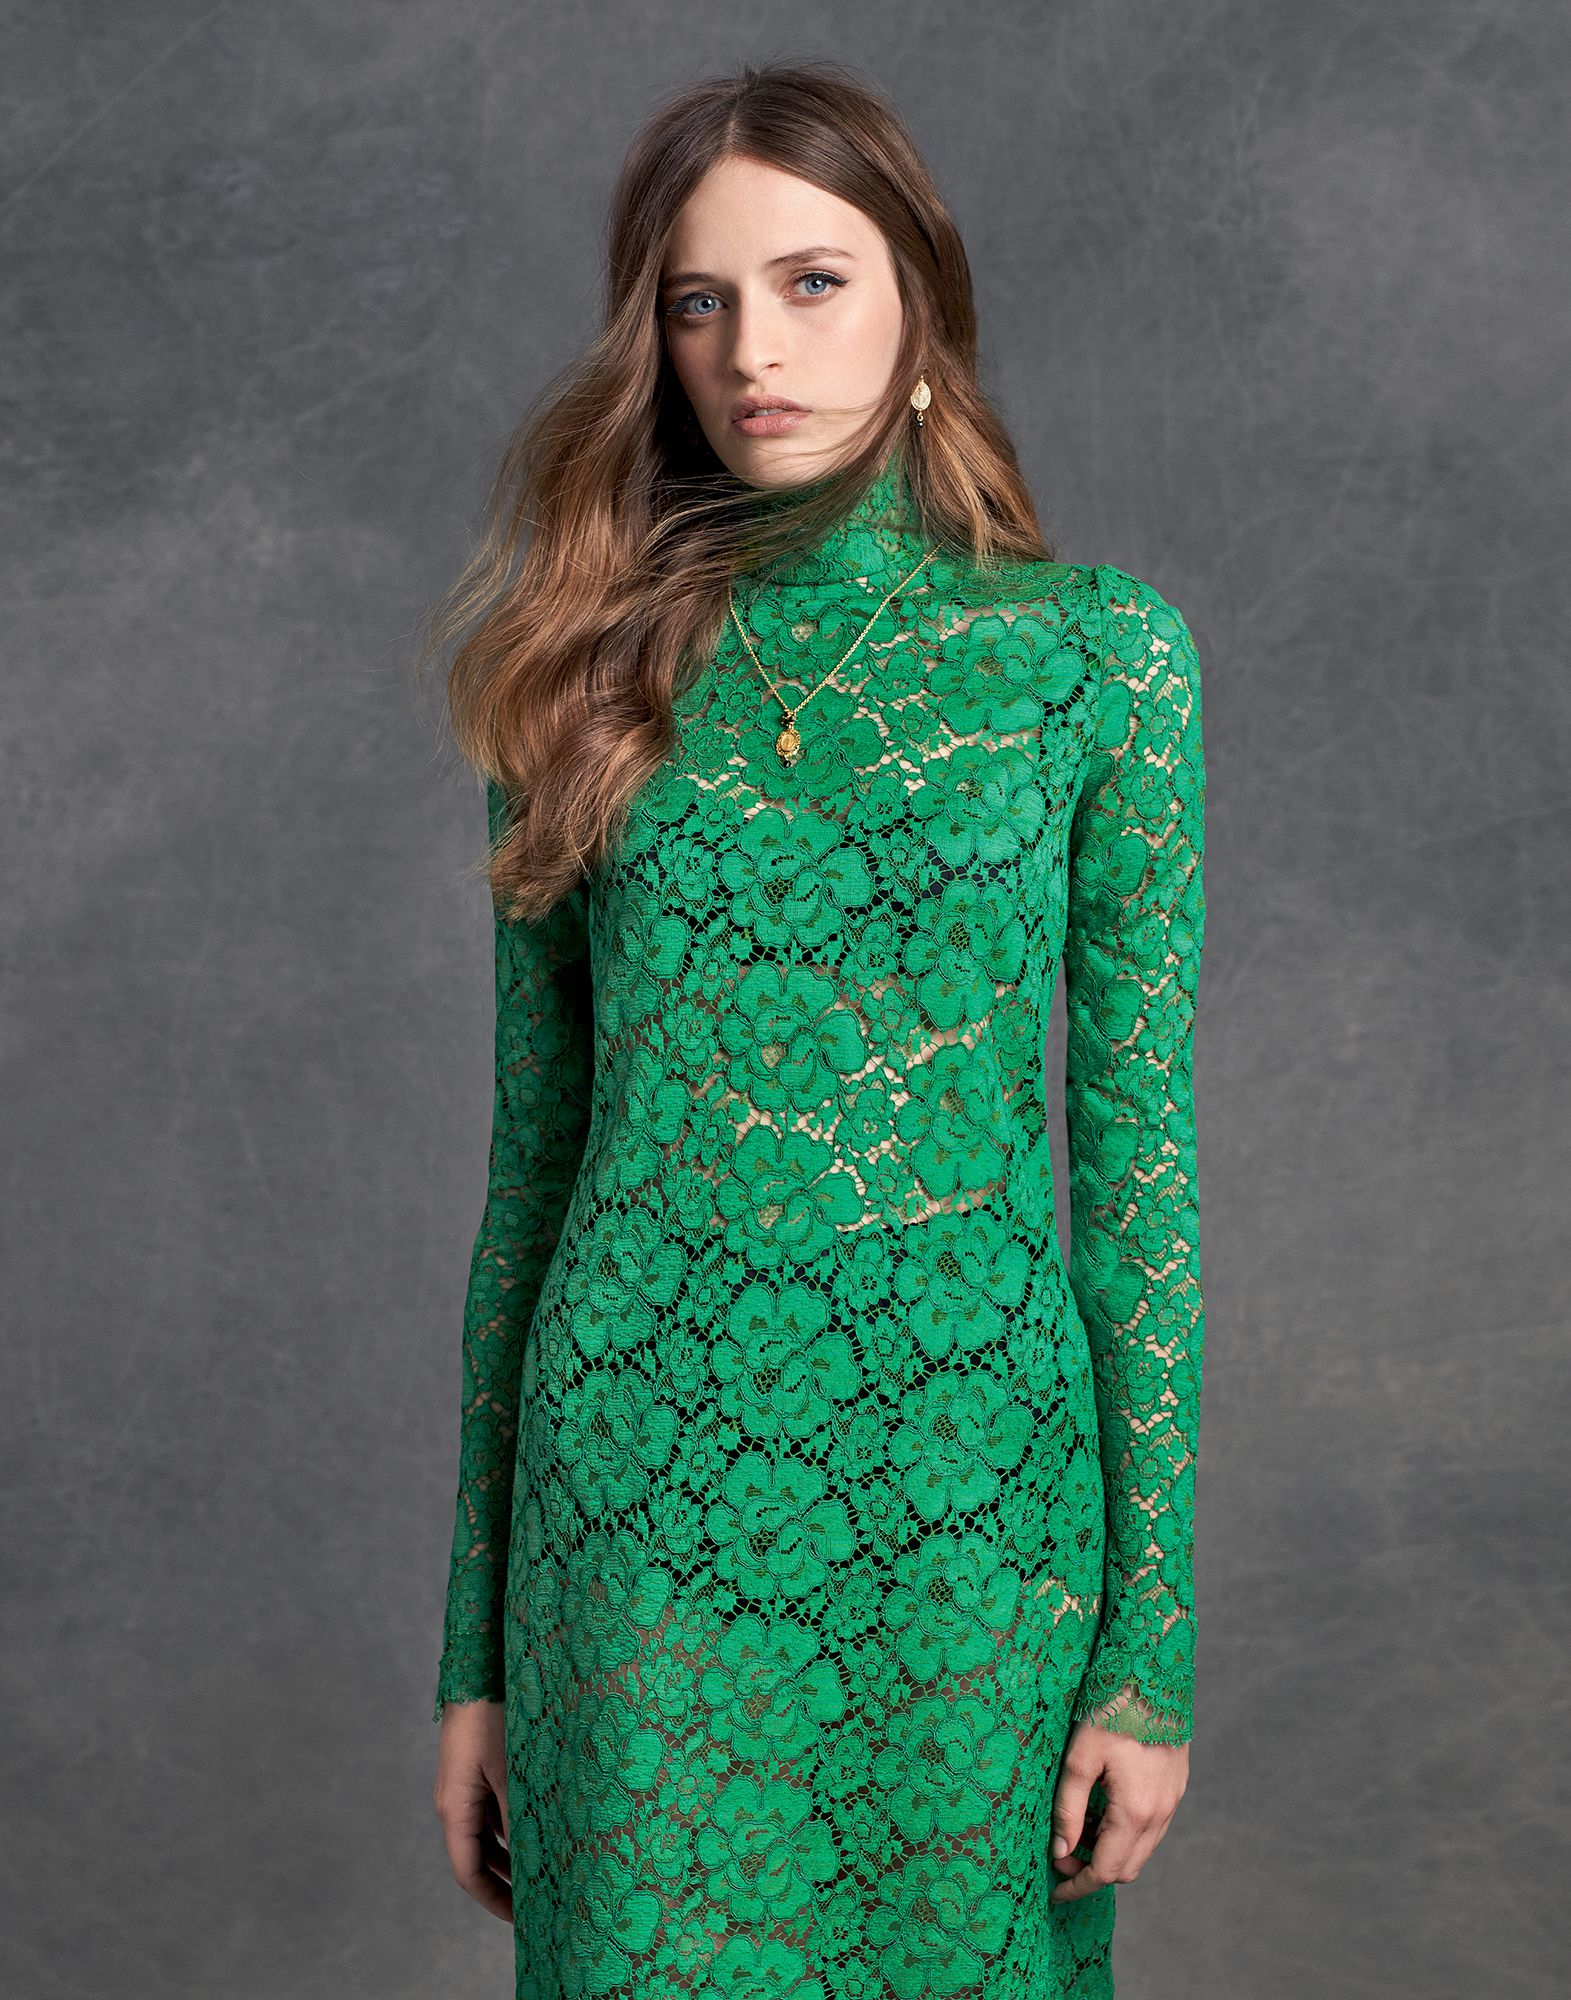 Dolce and gabbana green lace dress